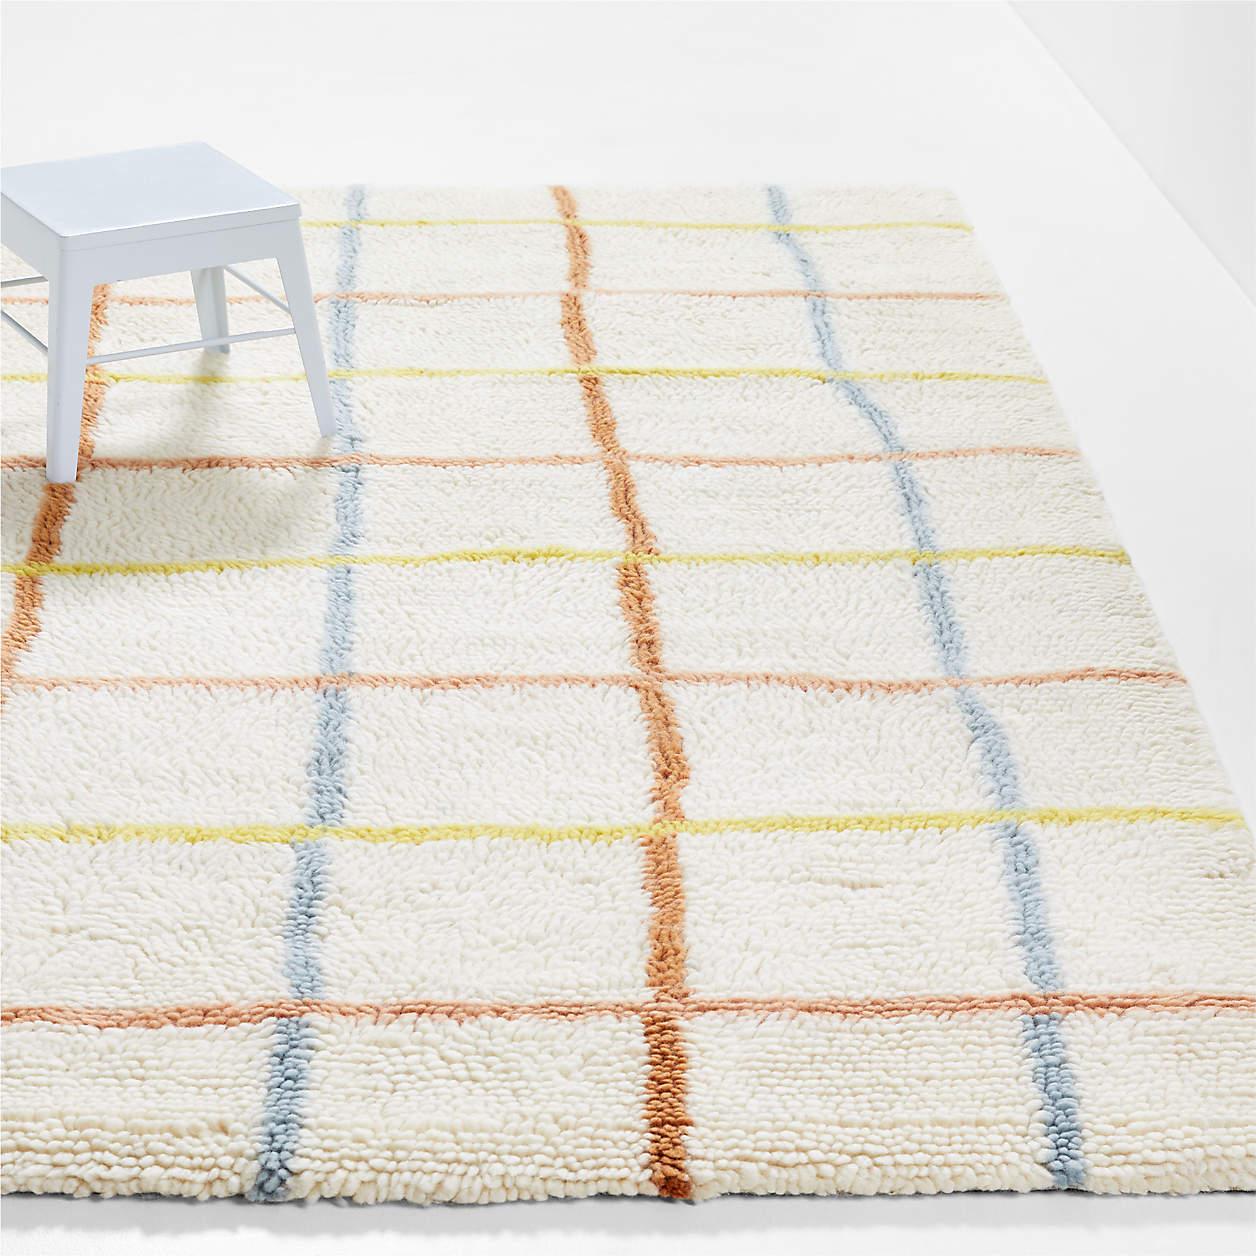 warm-colored-grid-washable-wool-rug